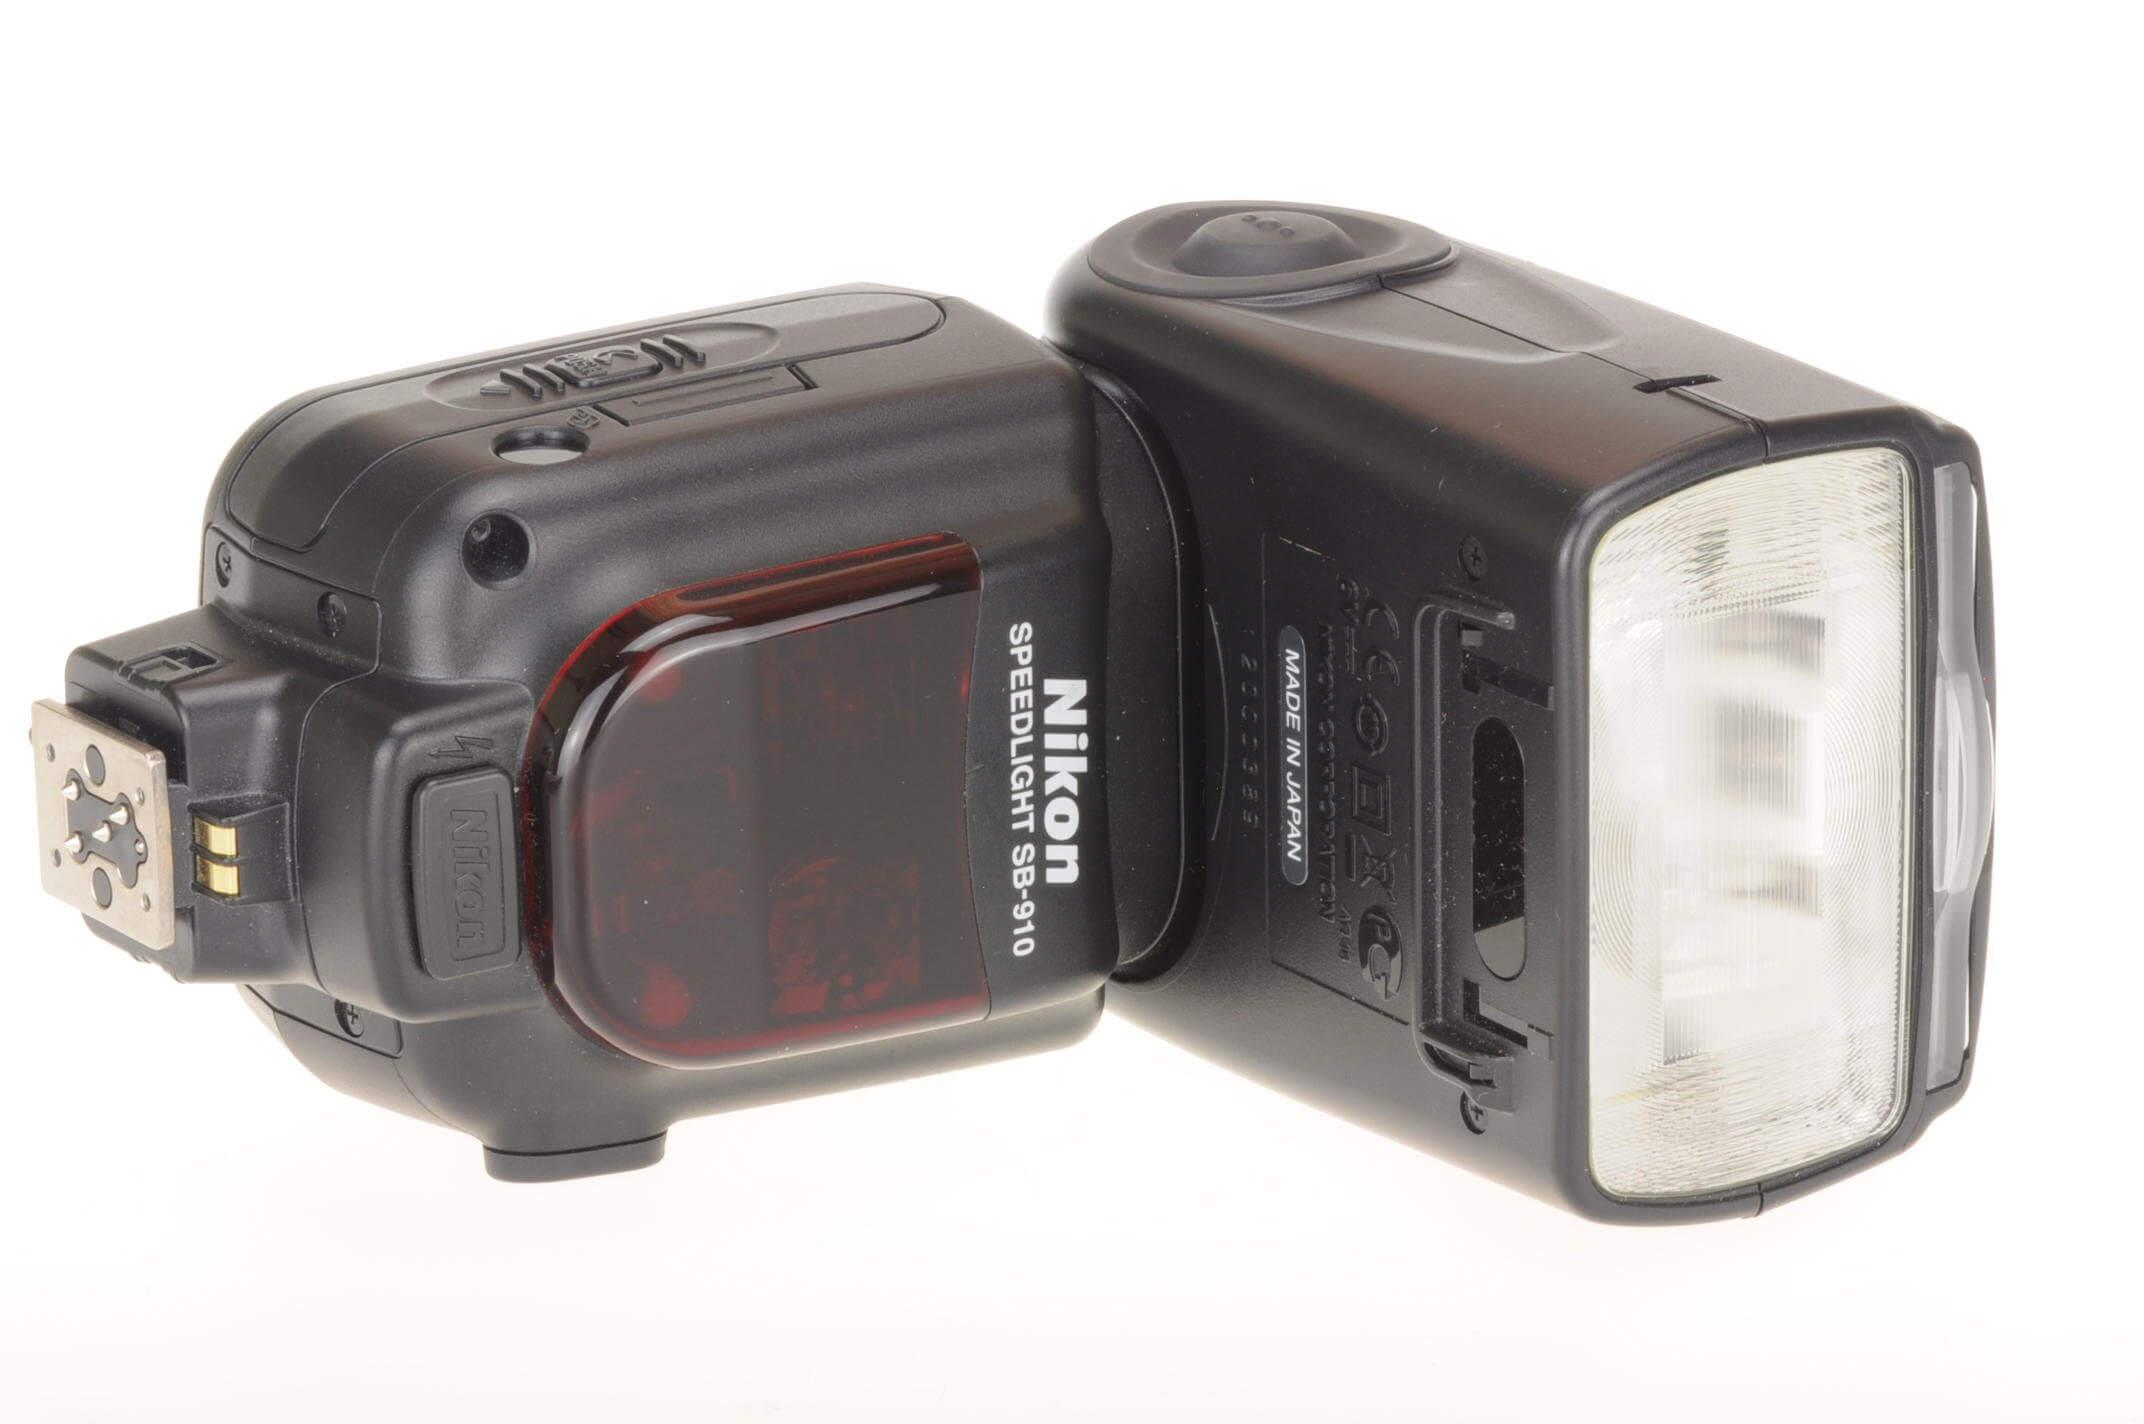 Nikon SB 910 Speedlight, excellent condition, boxed